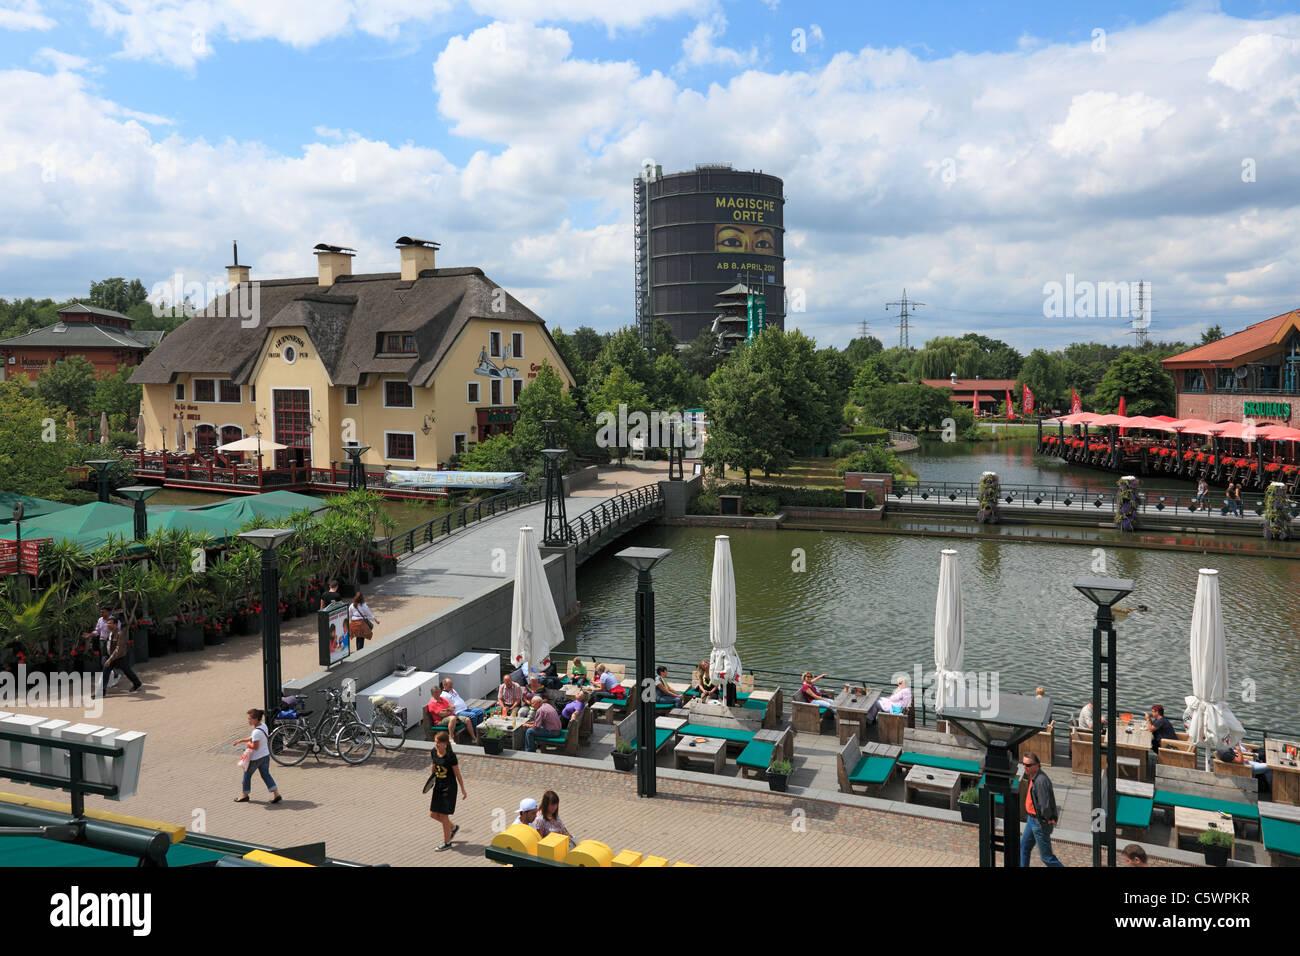 D-Oberhausen, Ruhr area, Lower Rhine, North Rhine-Westphalia, NRW, D-Oberhausen-Neue Mitte, Ruhr 2010, Cultural Stock Photo